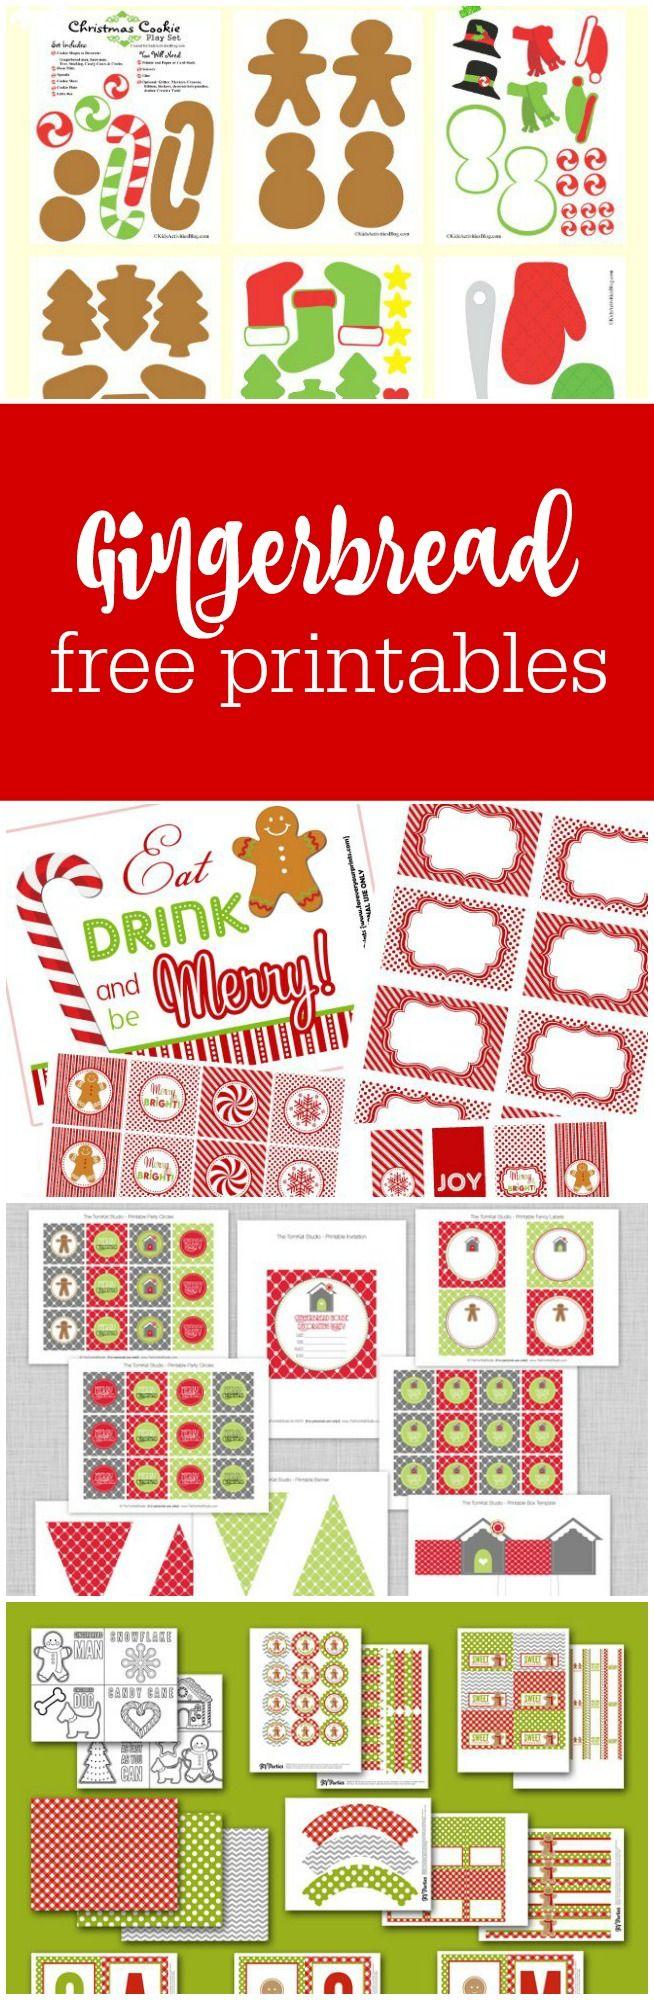 1249 best printables images on Pinterest | Birthdays, Free ...